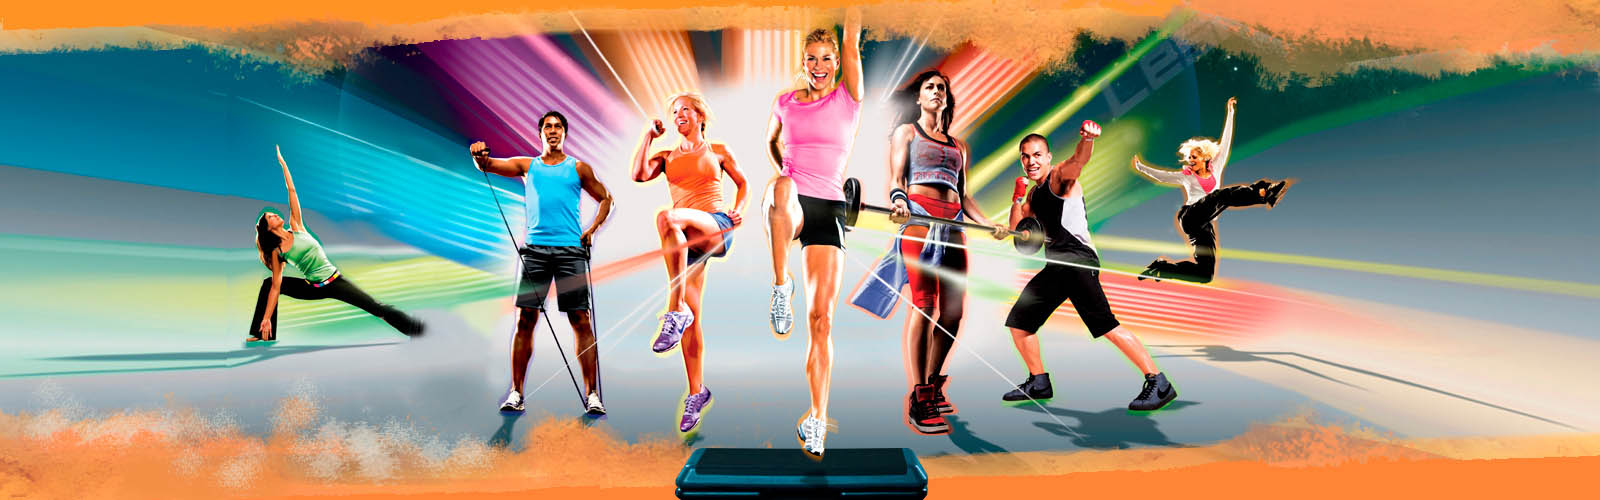 mills-rennes-fitness